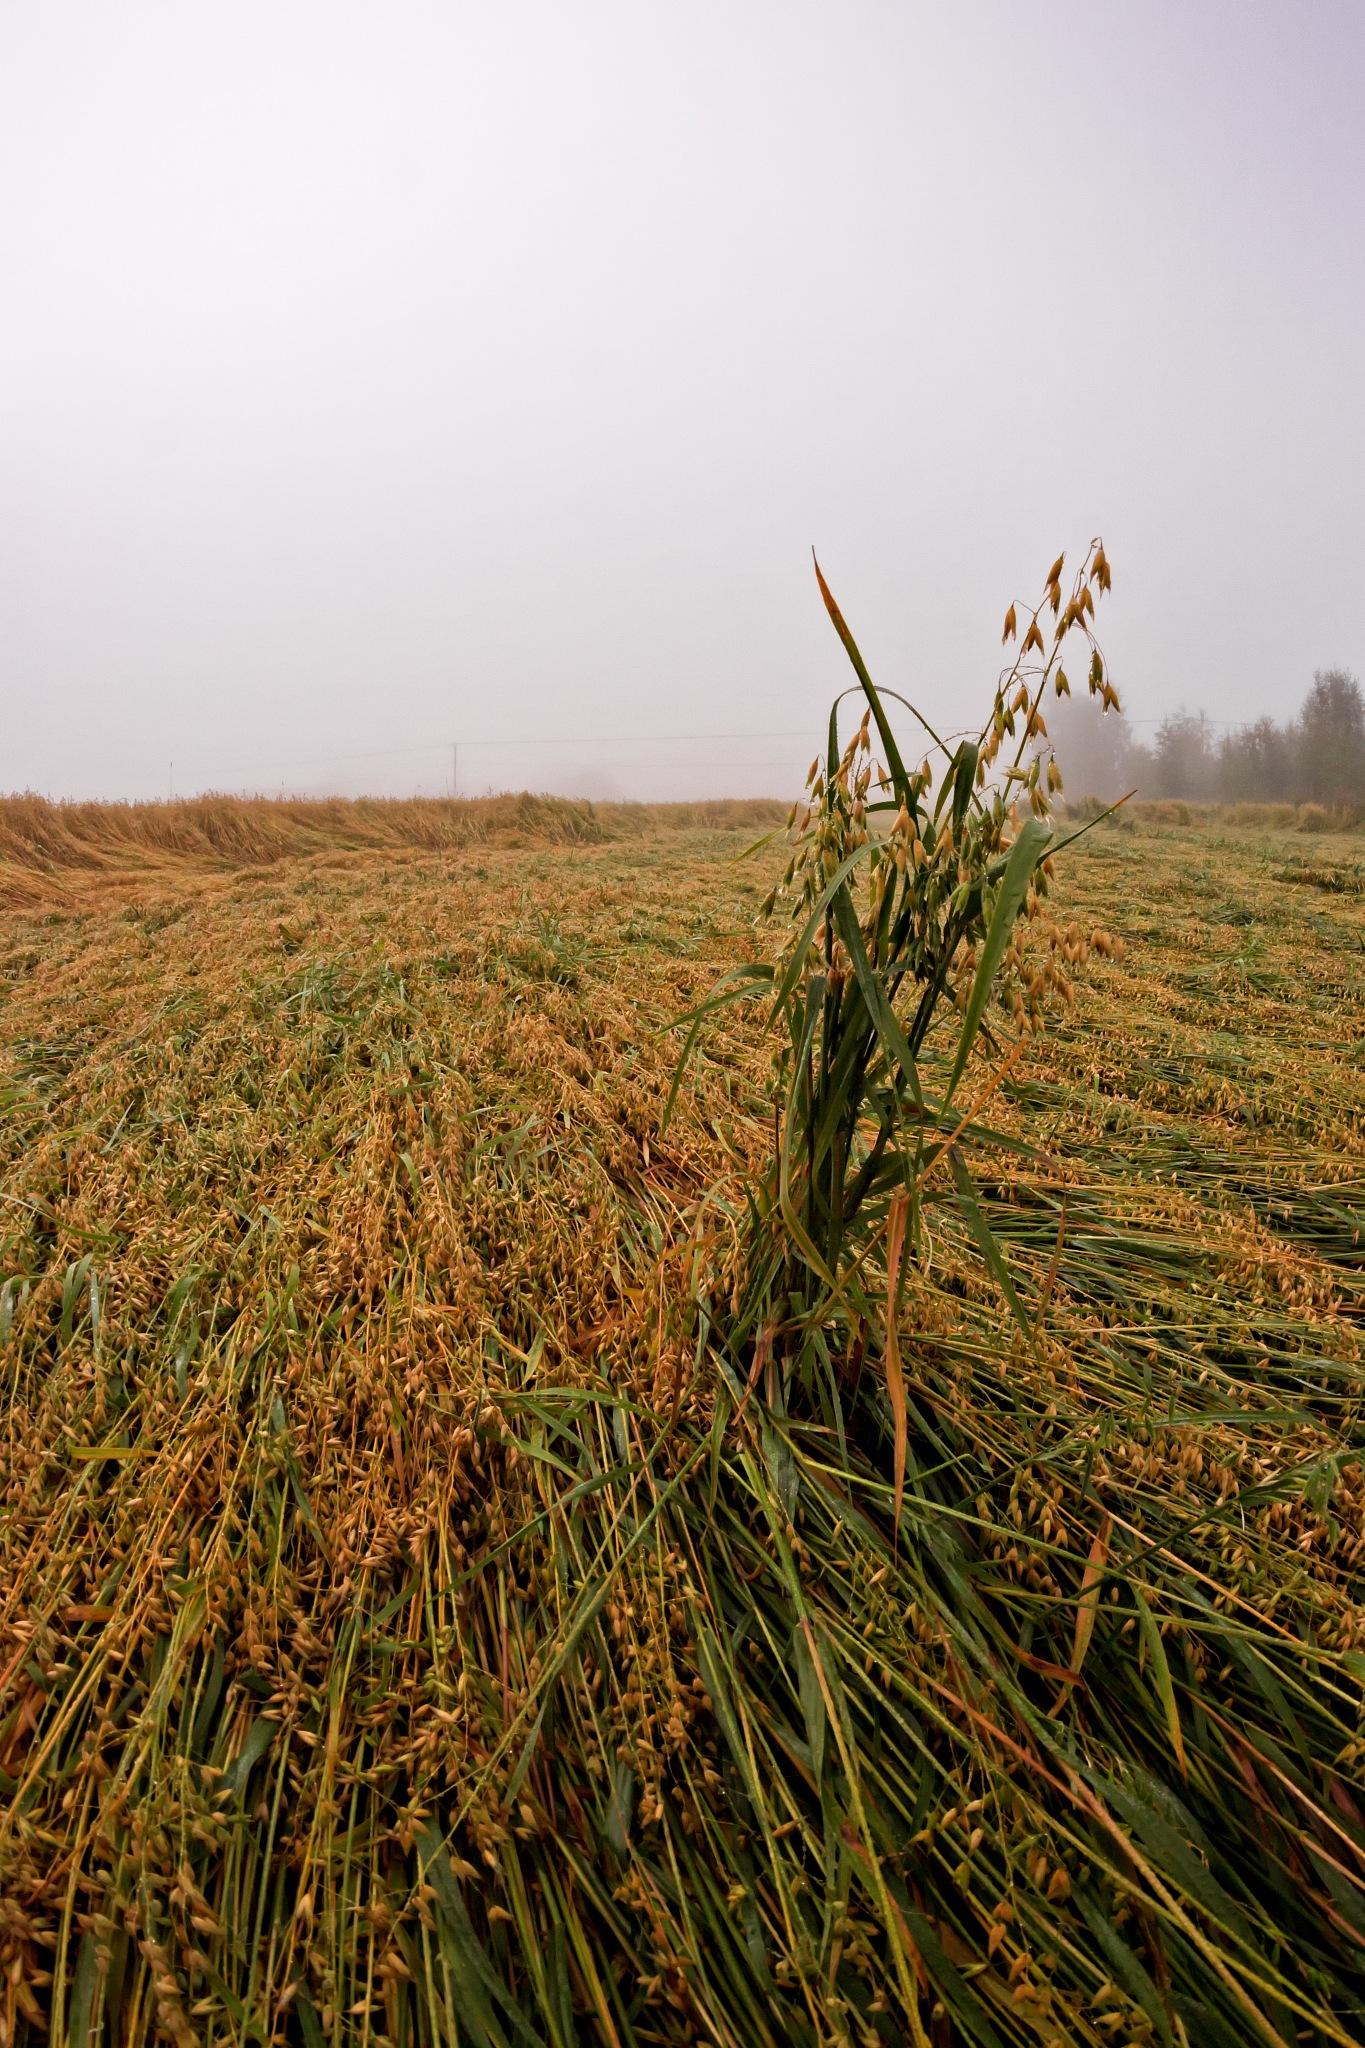 Lodged Oat On The Field by J.P. Heinovirta